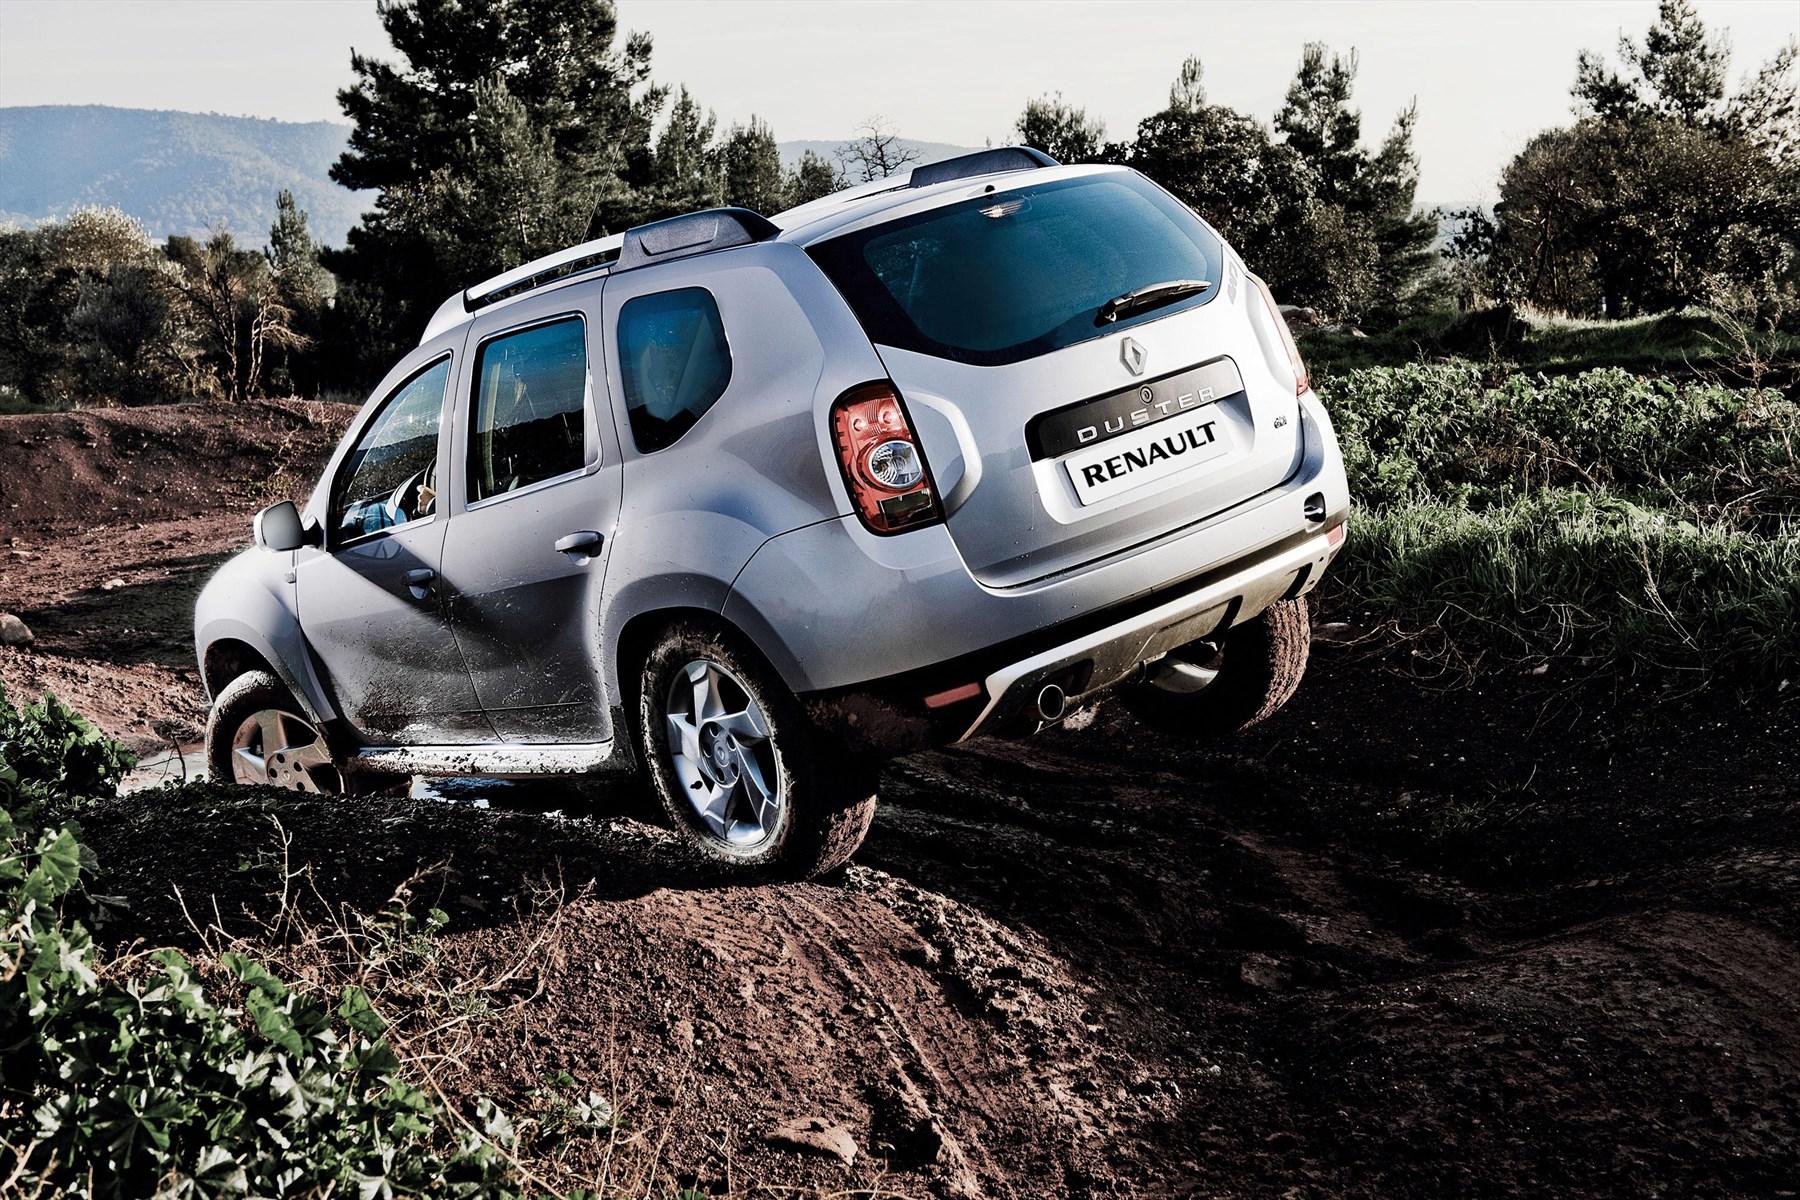 Renault Duster 1.5 dCI Dynamique 4×4 (2014): New Car Review